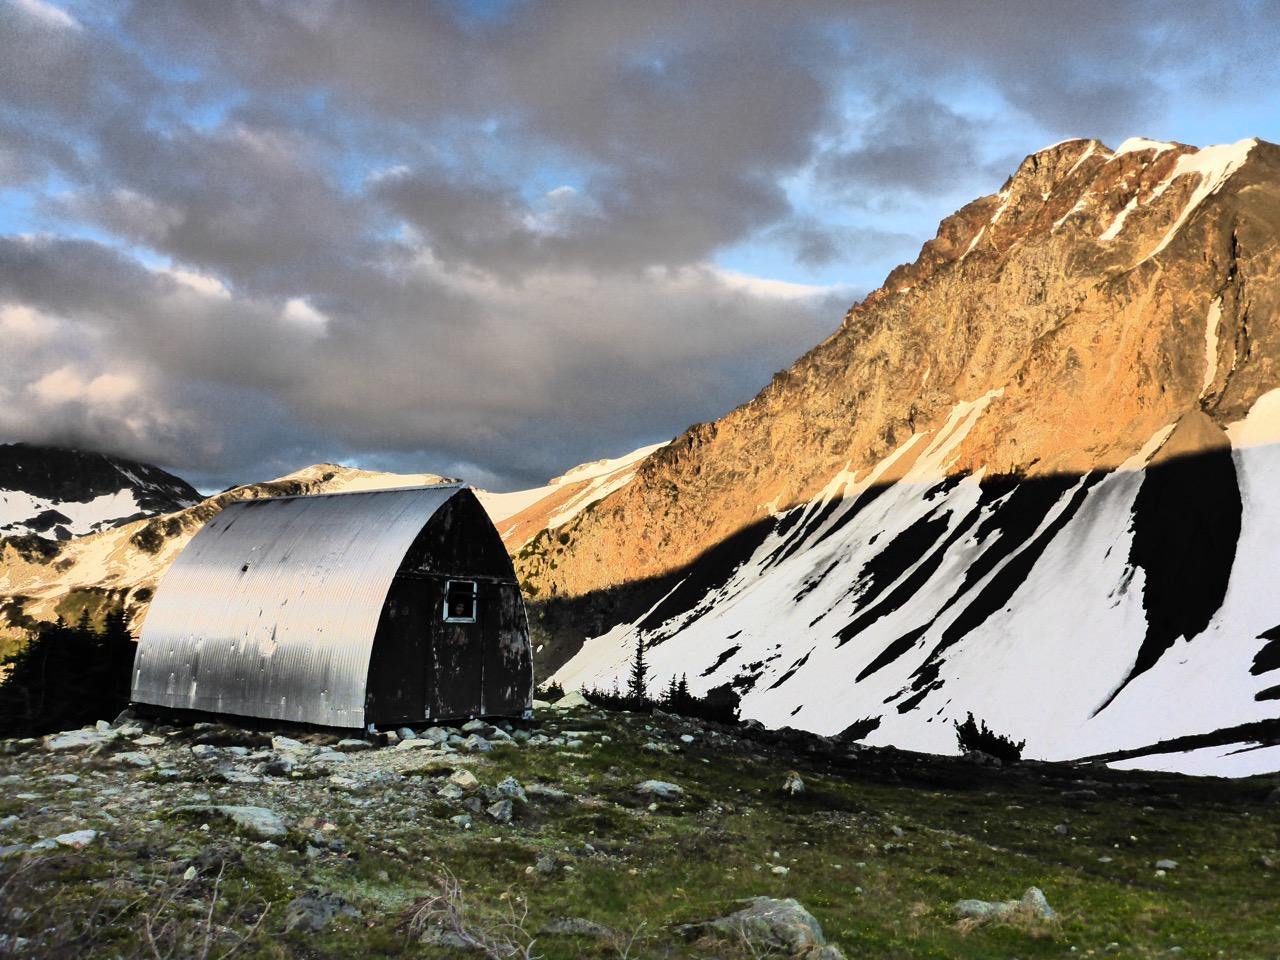 Hut British Columbia, Canada